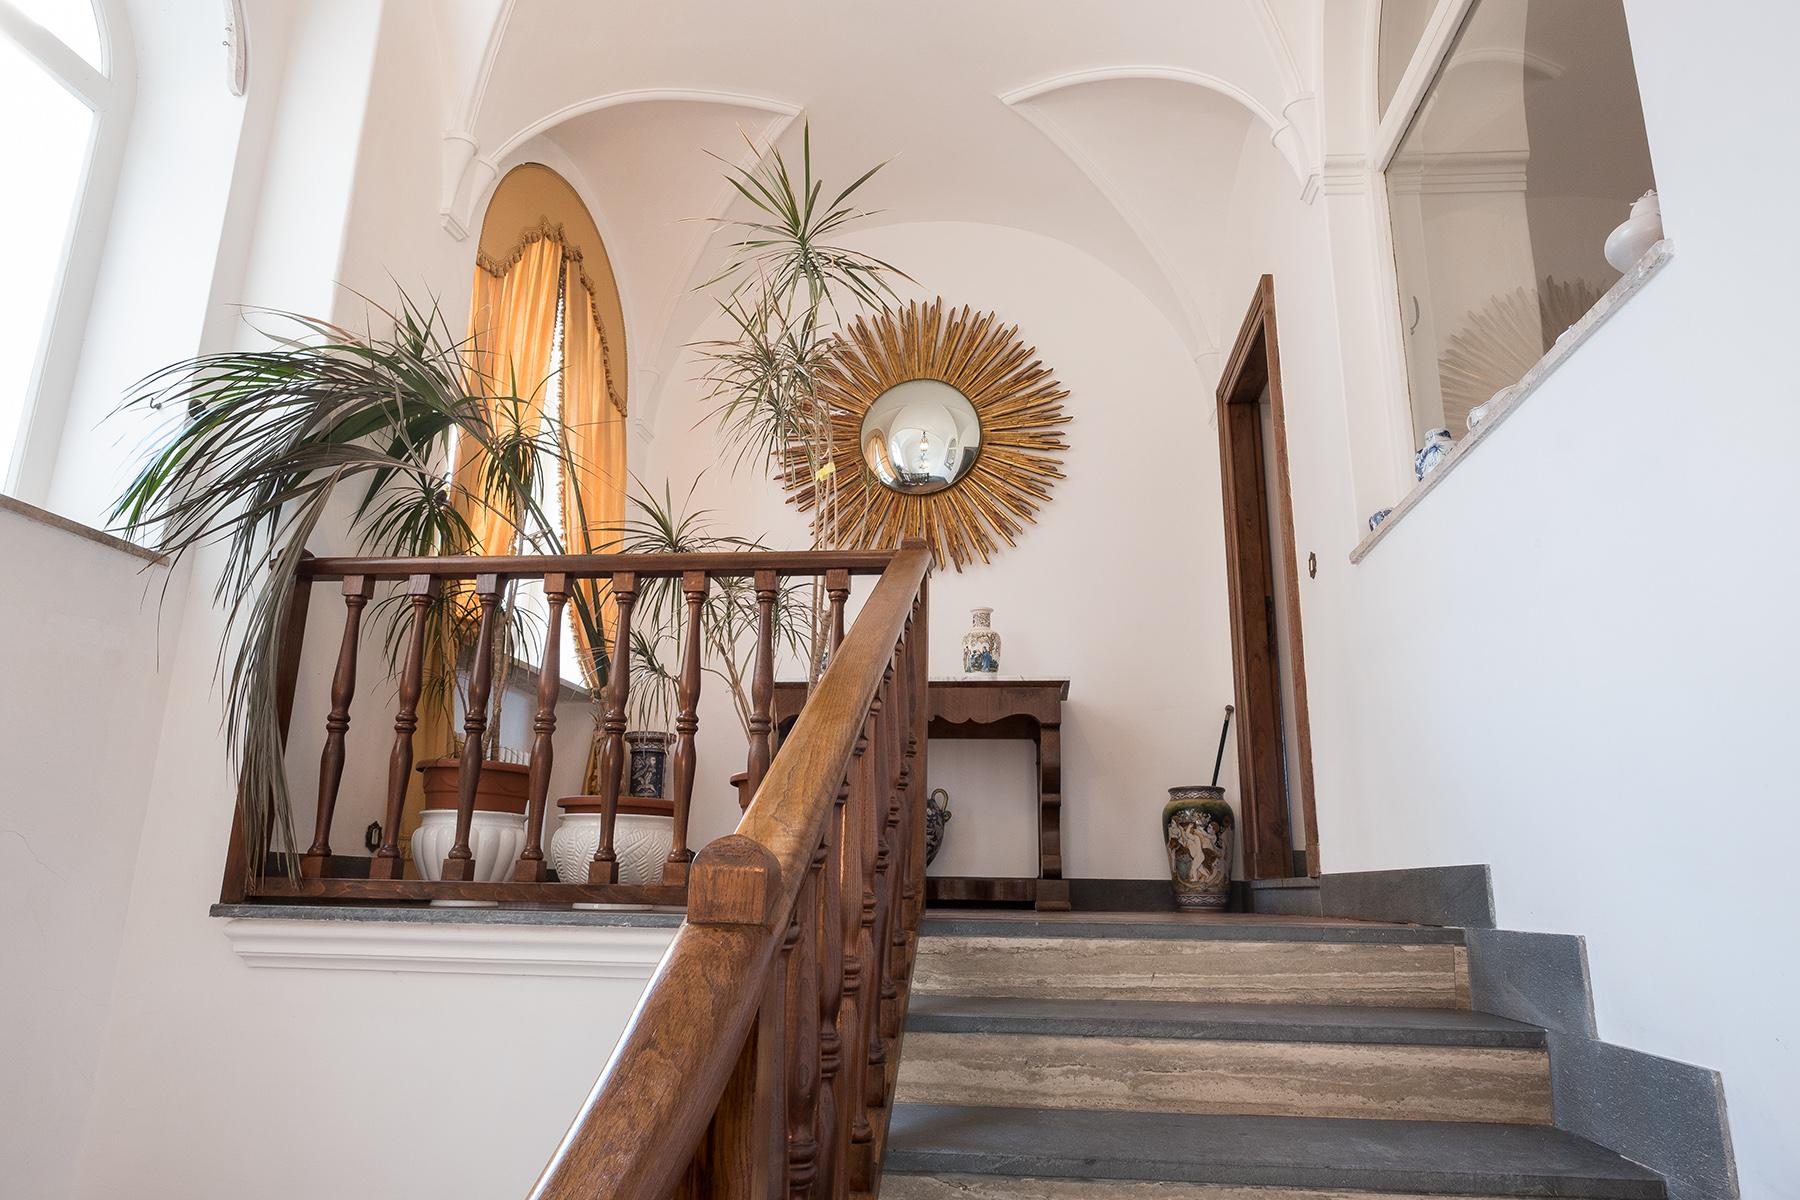 Casa indipendente in Vendita a Capri: 5 locali, 400 mq - Foto 6